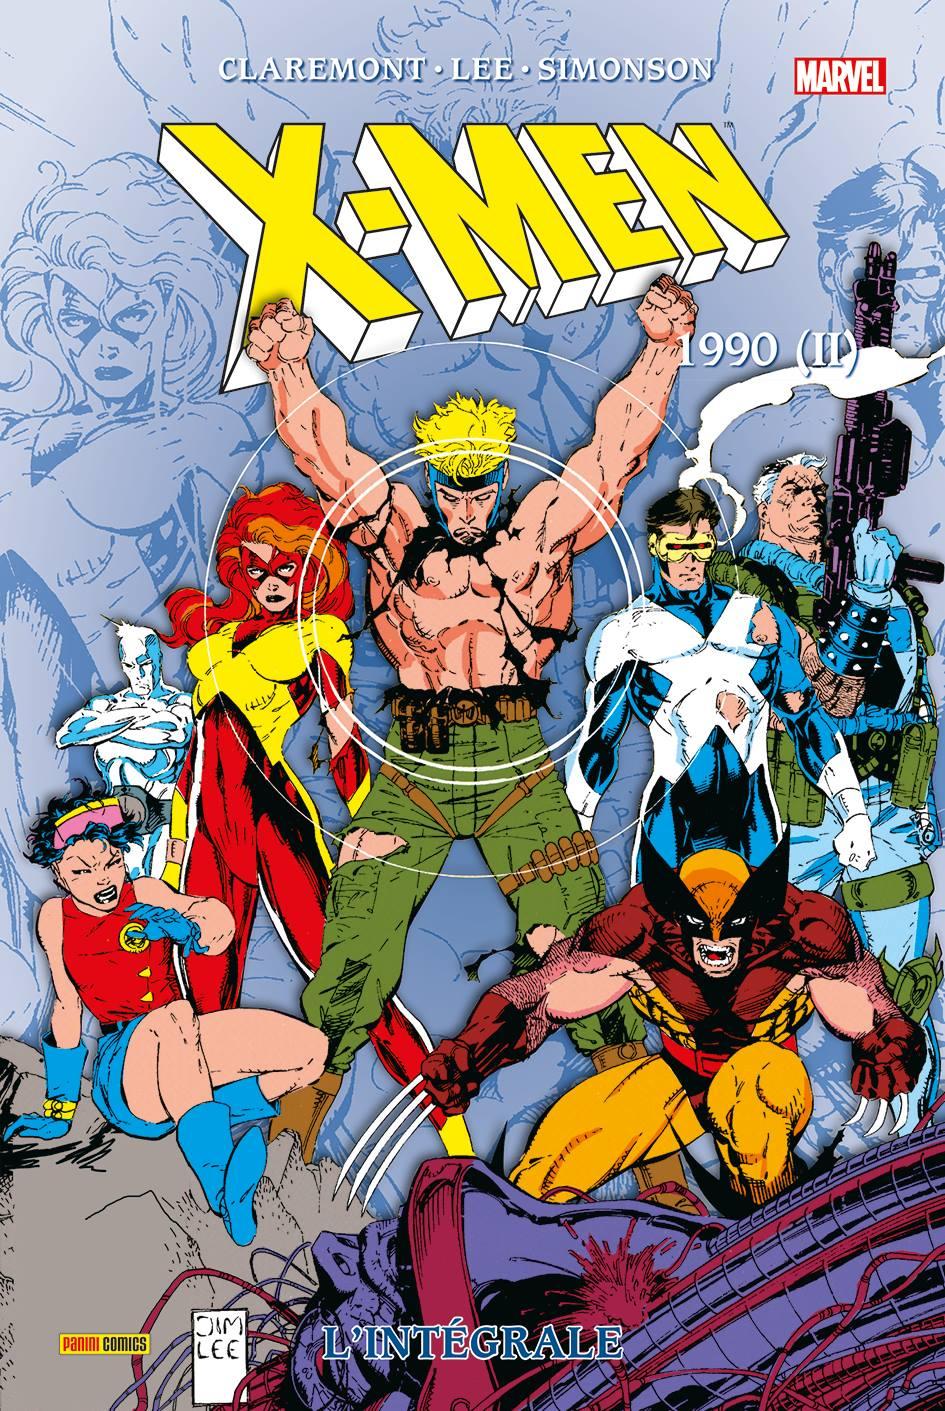 X-MEN : L'INTÉGRALE 1990 (II)